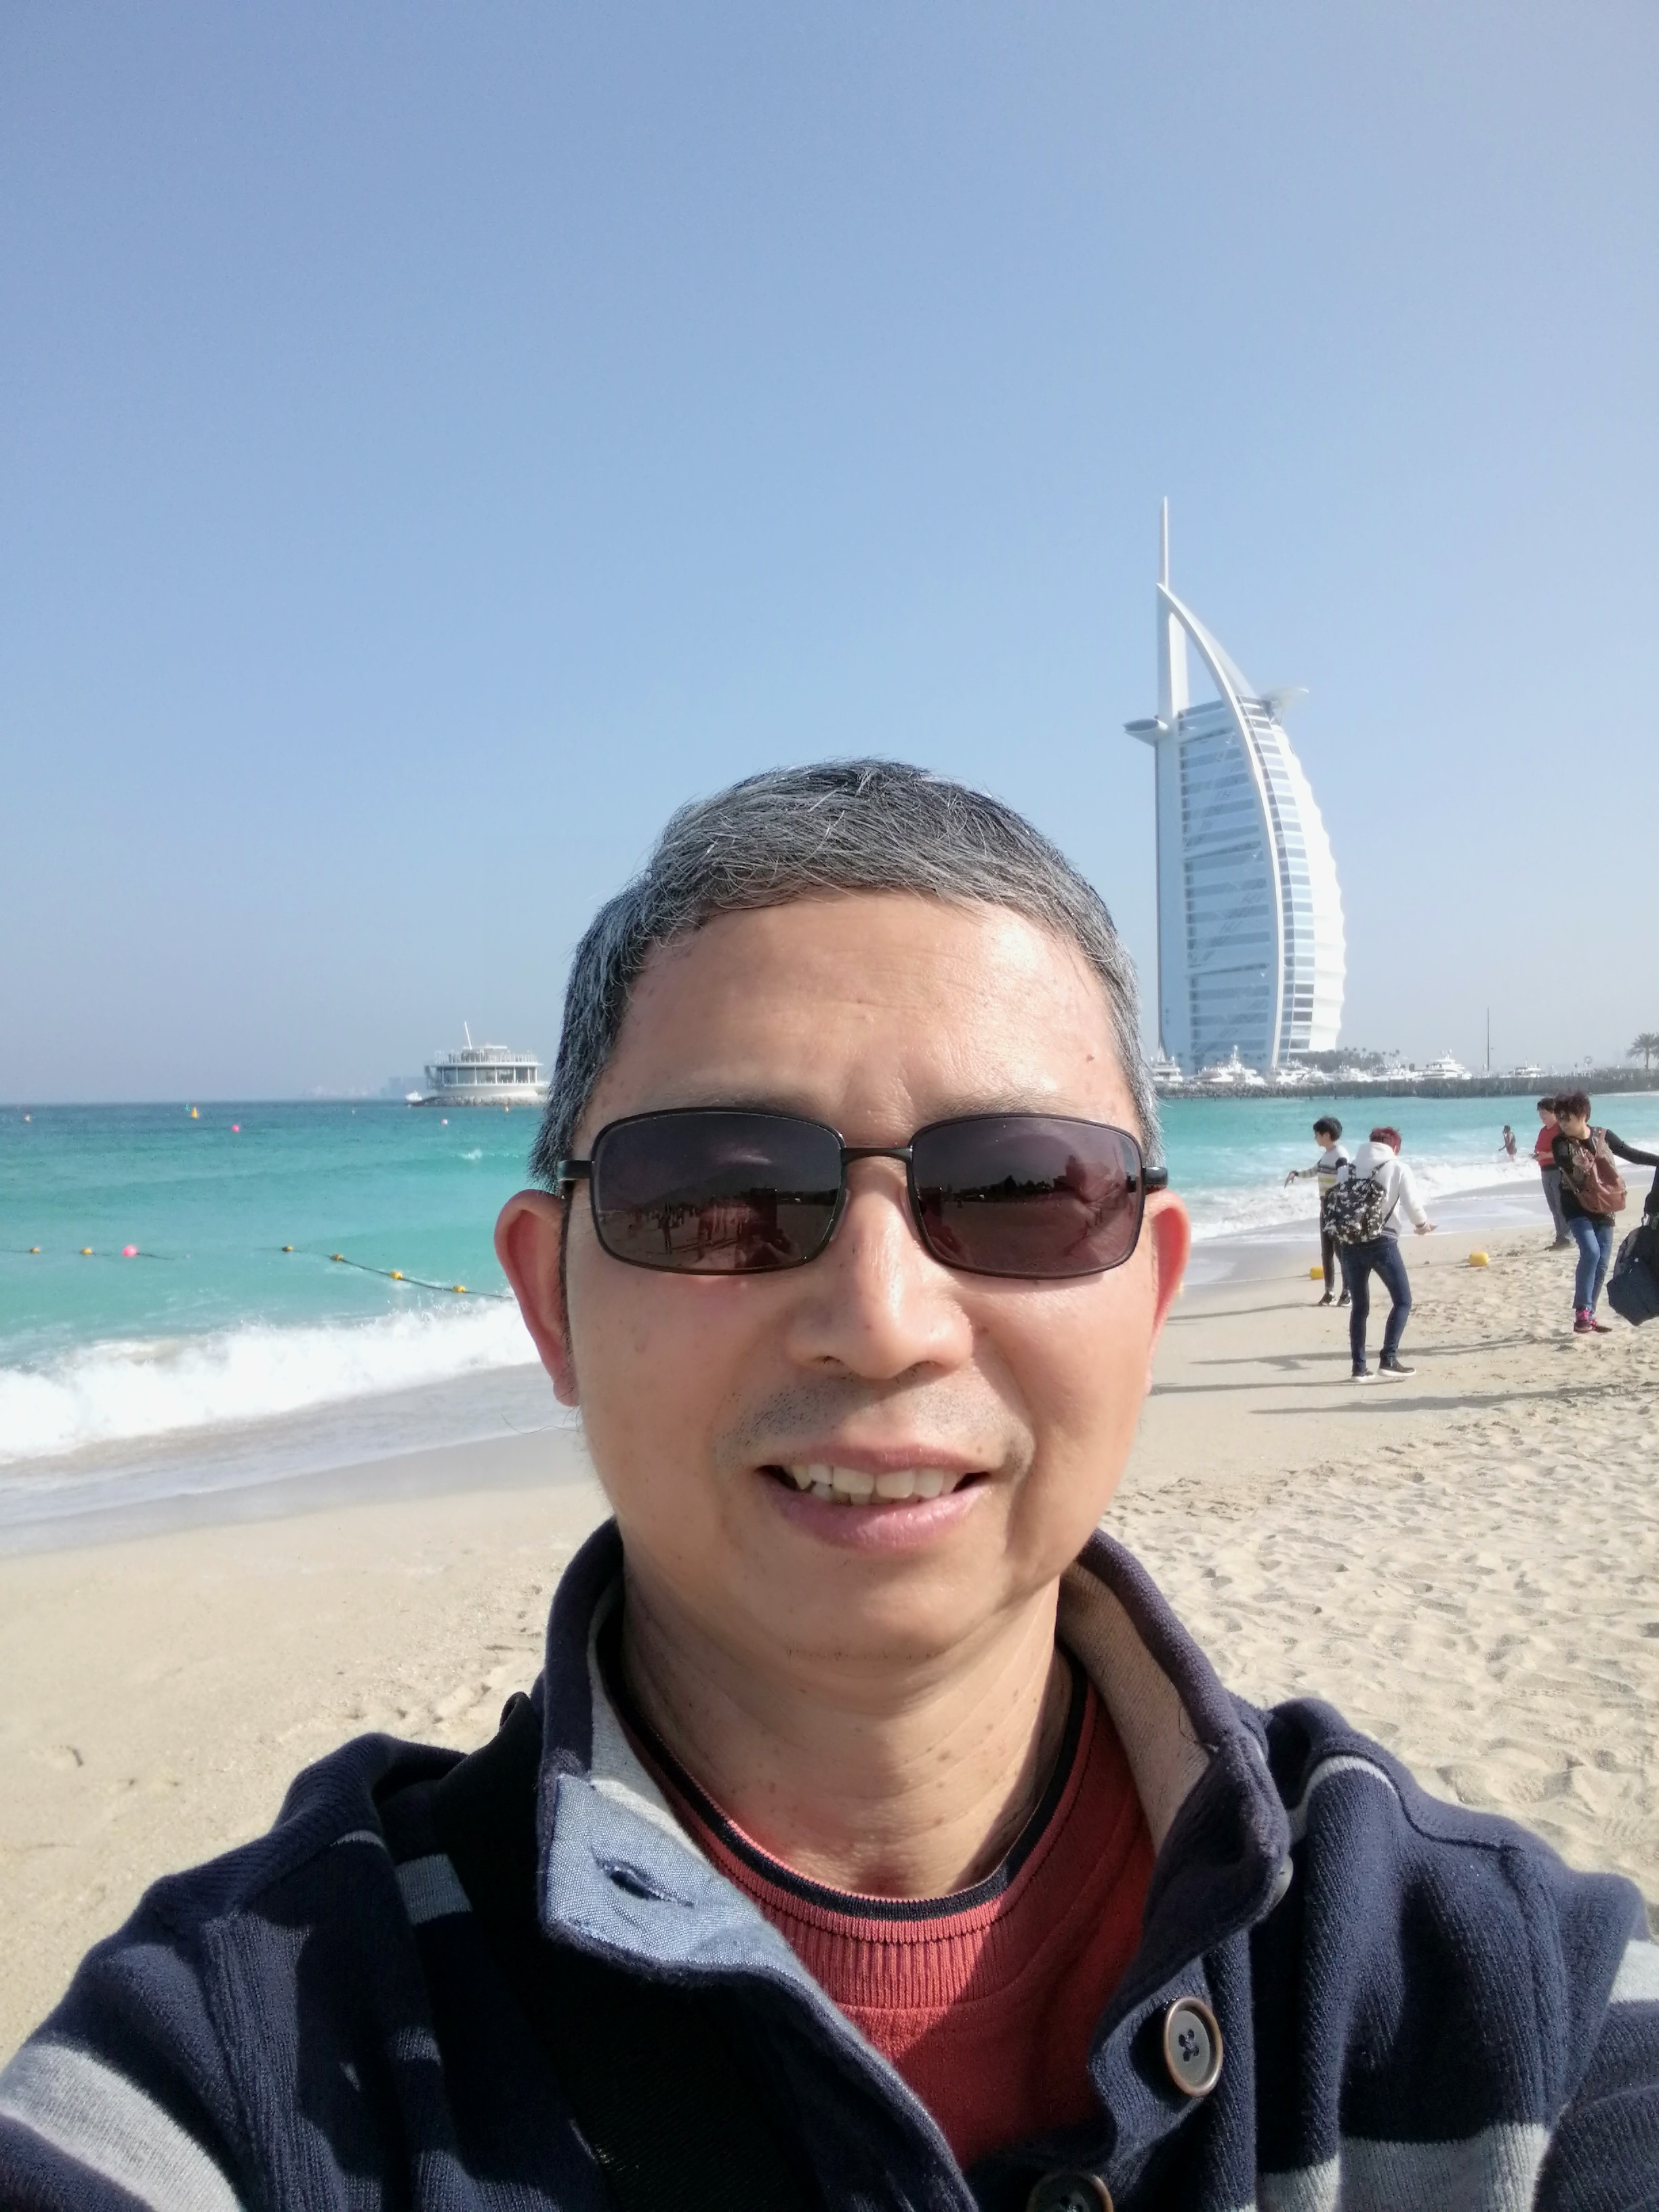 Jumeirah Public Beach Attractions Dubai Travel Review Travel Guide Trip Com